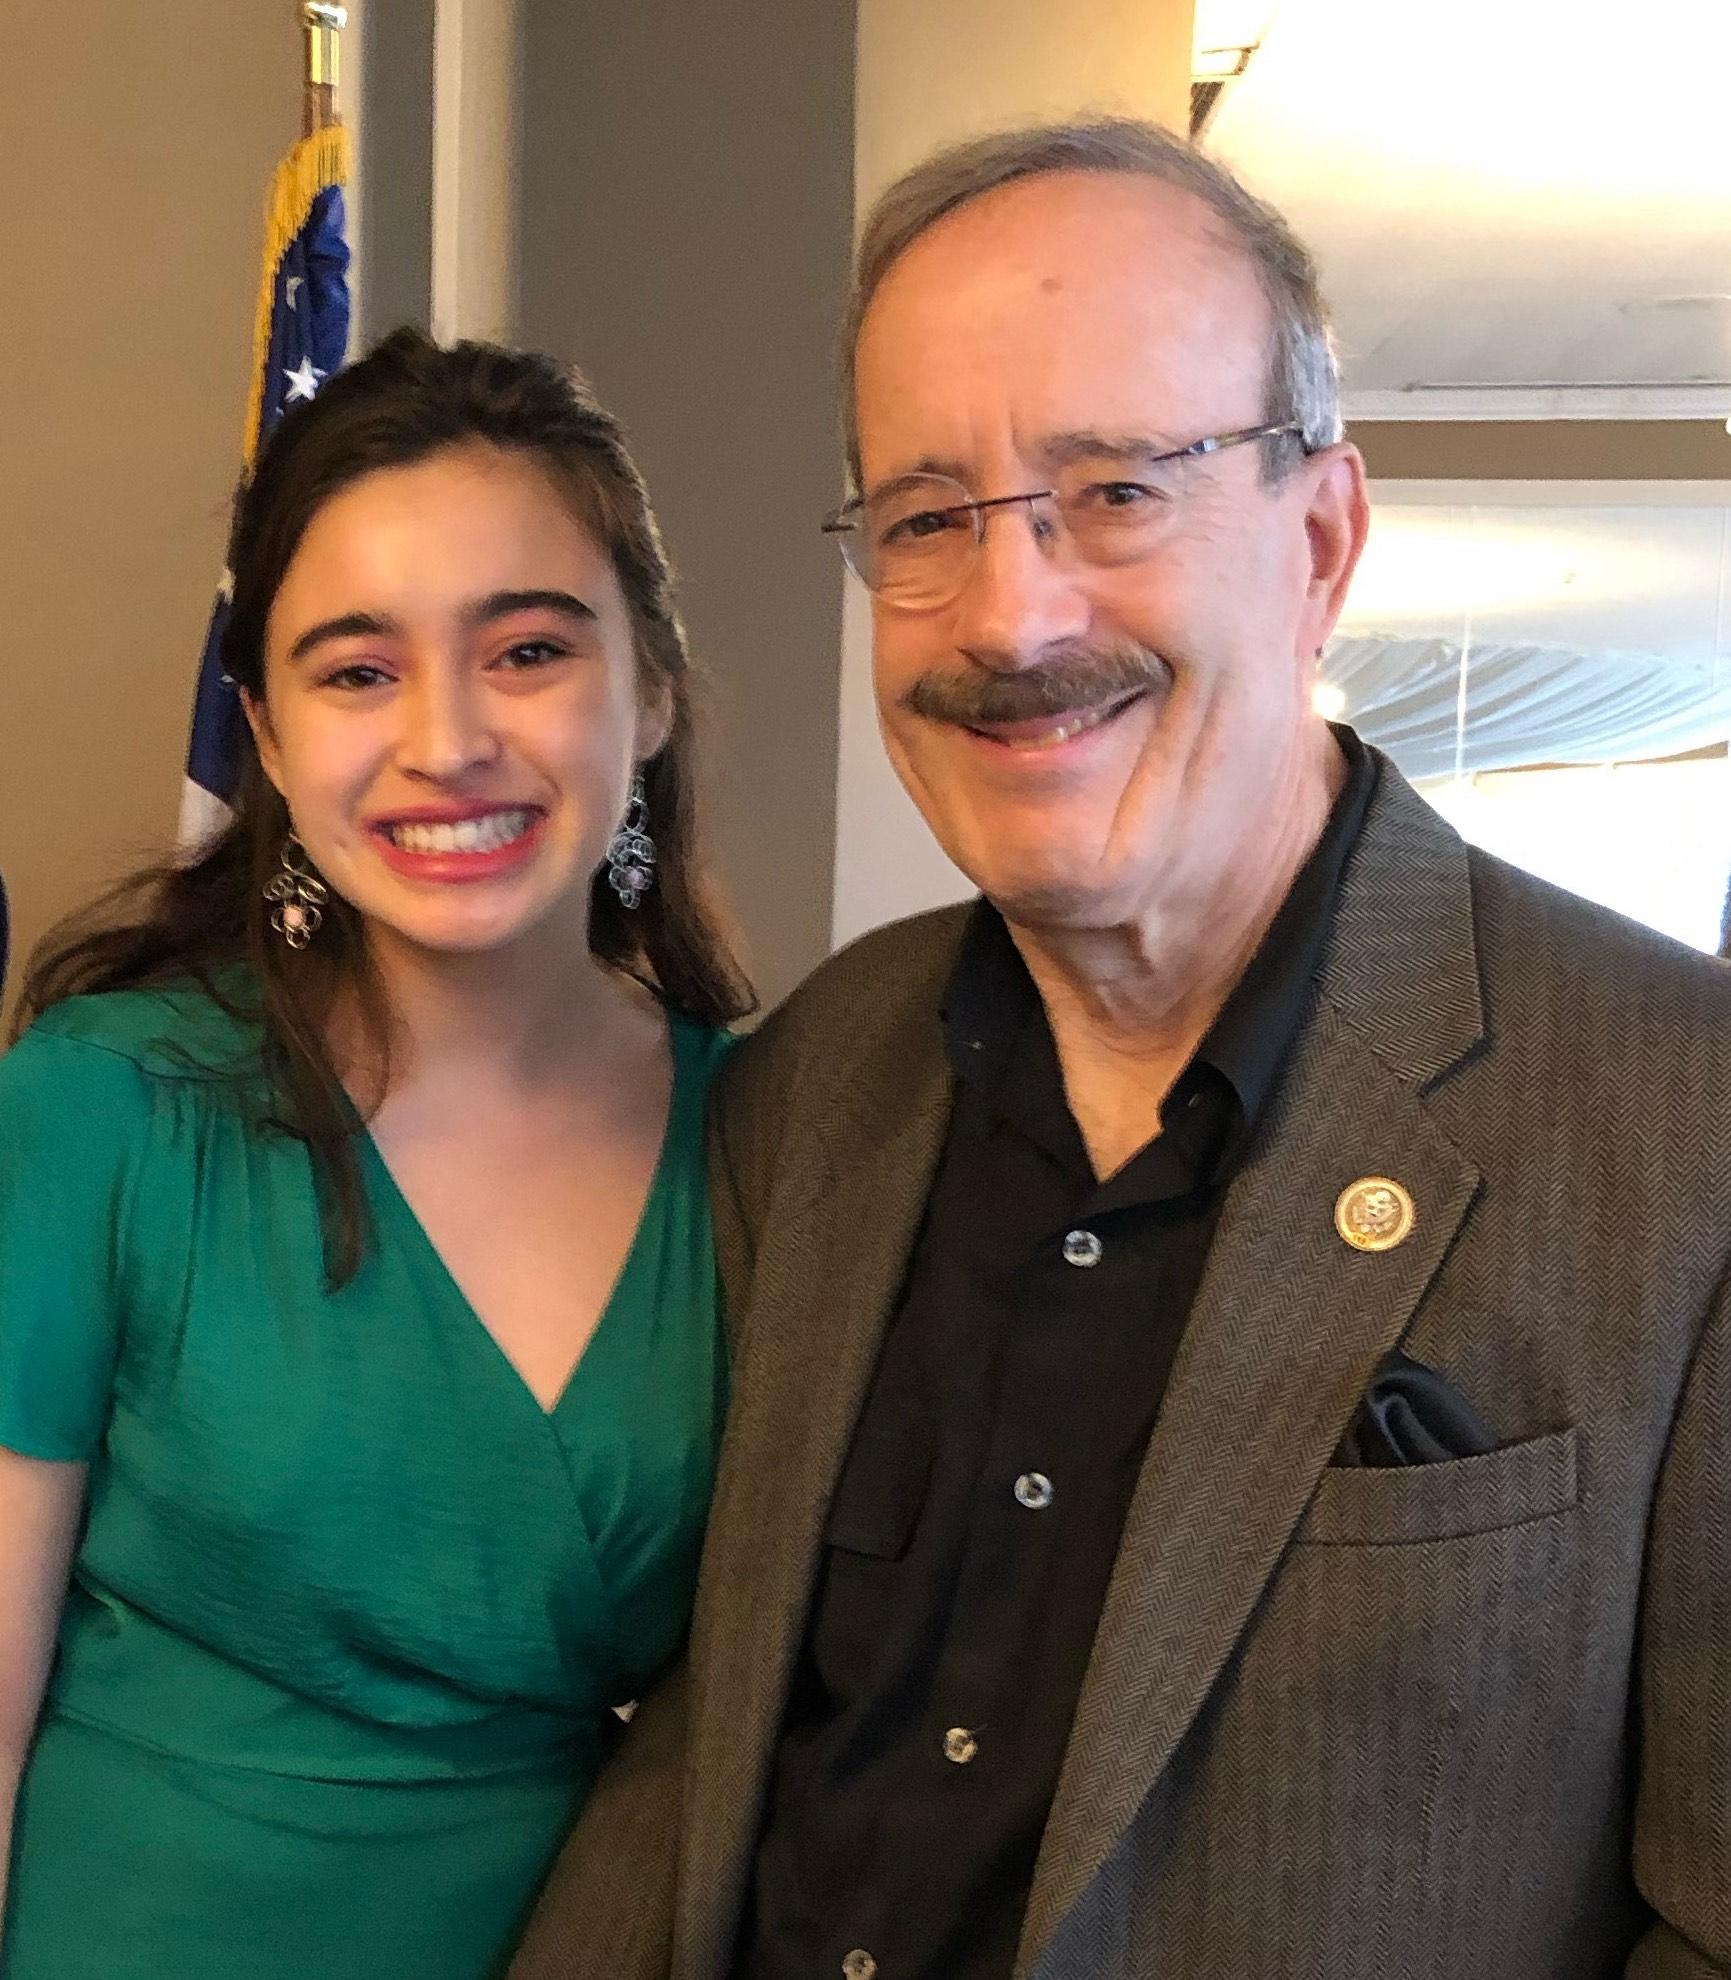 Lauren Cuevas and Congressman Engel